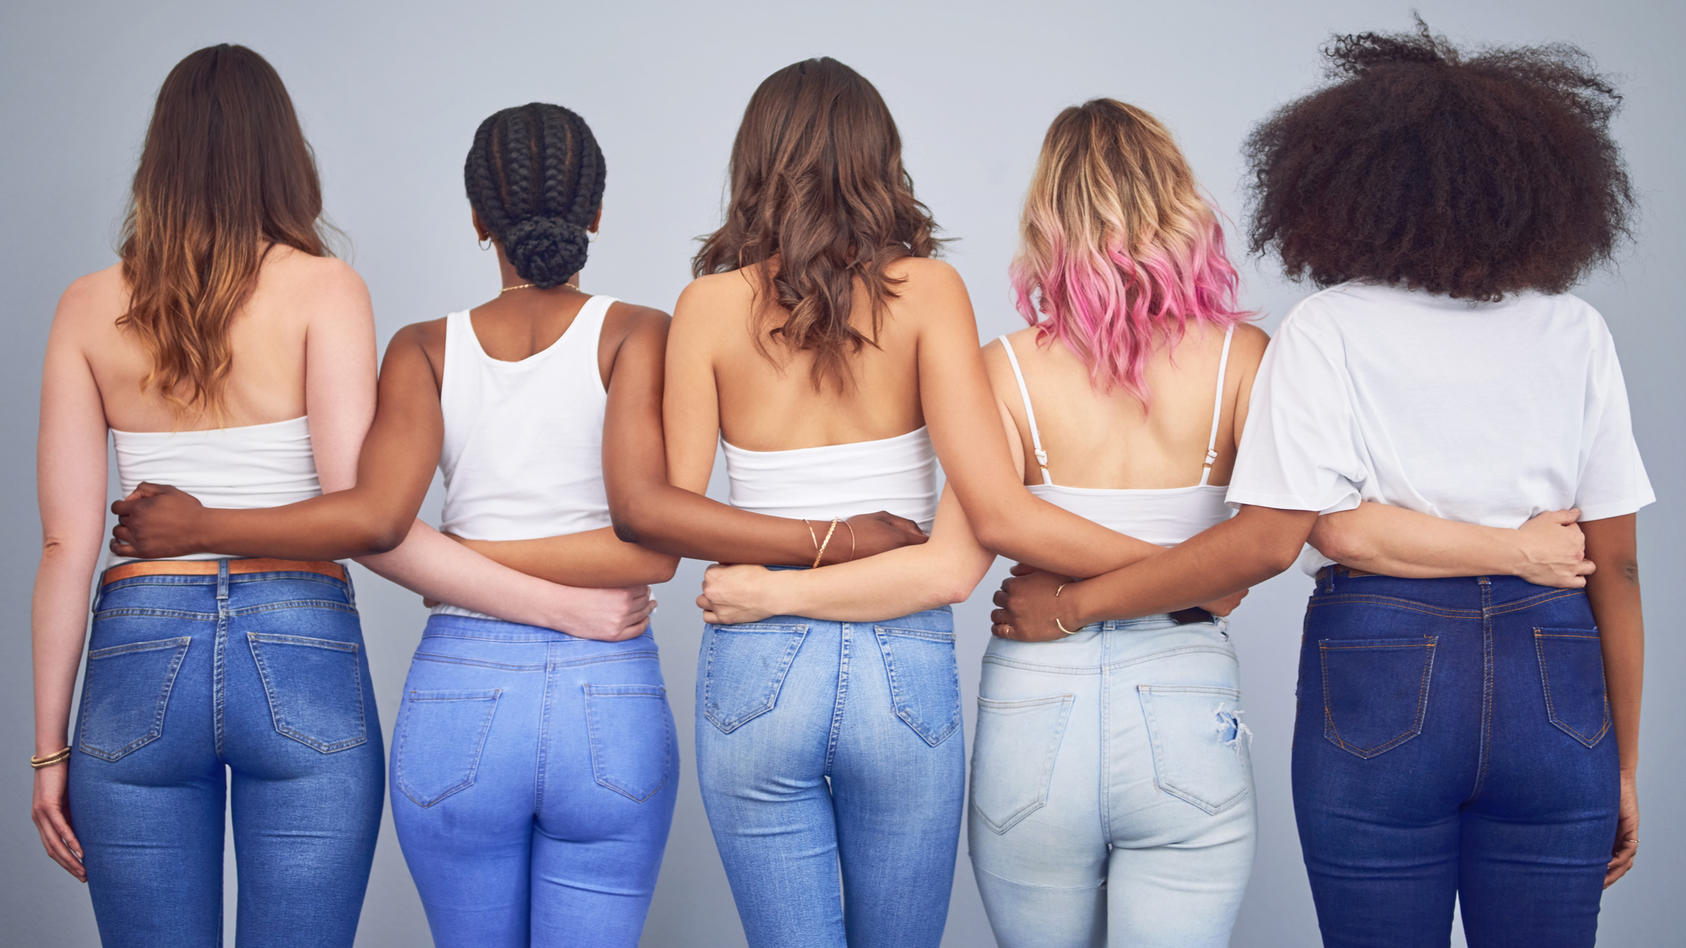 günstige jeans im outlet: wie sie online die perfekte jeans